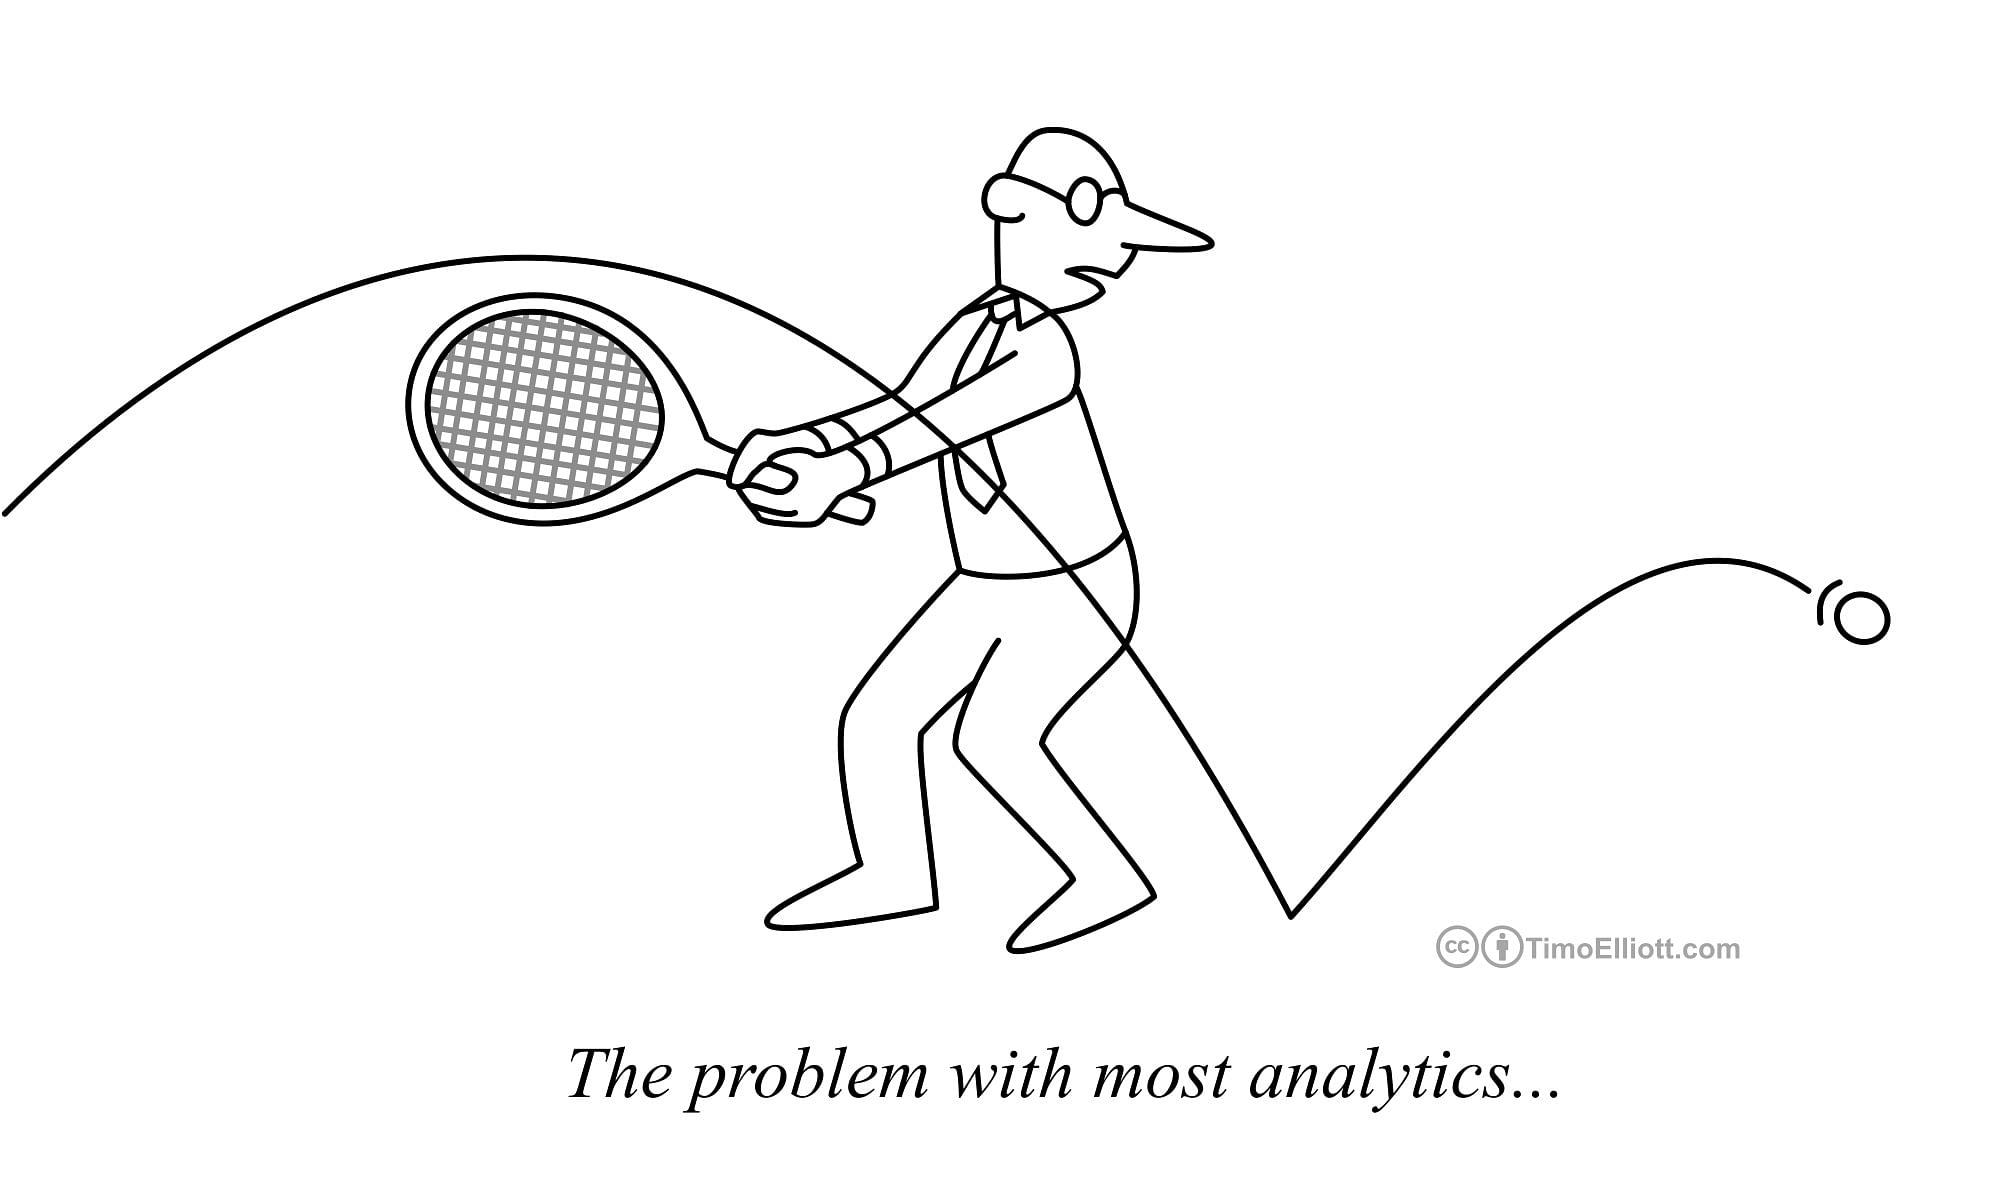 Tennis vs Analytics: Love-all, Play!